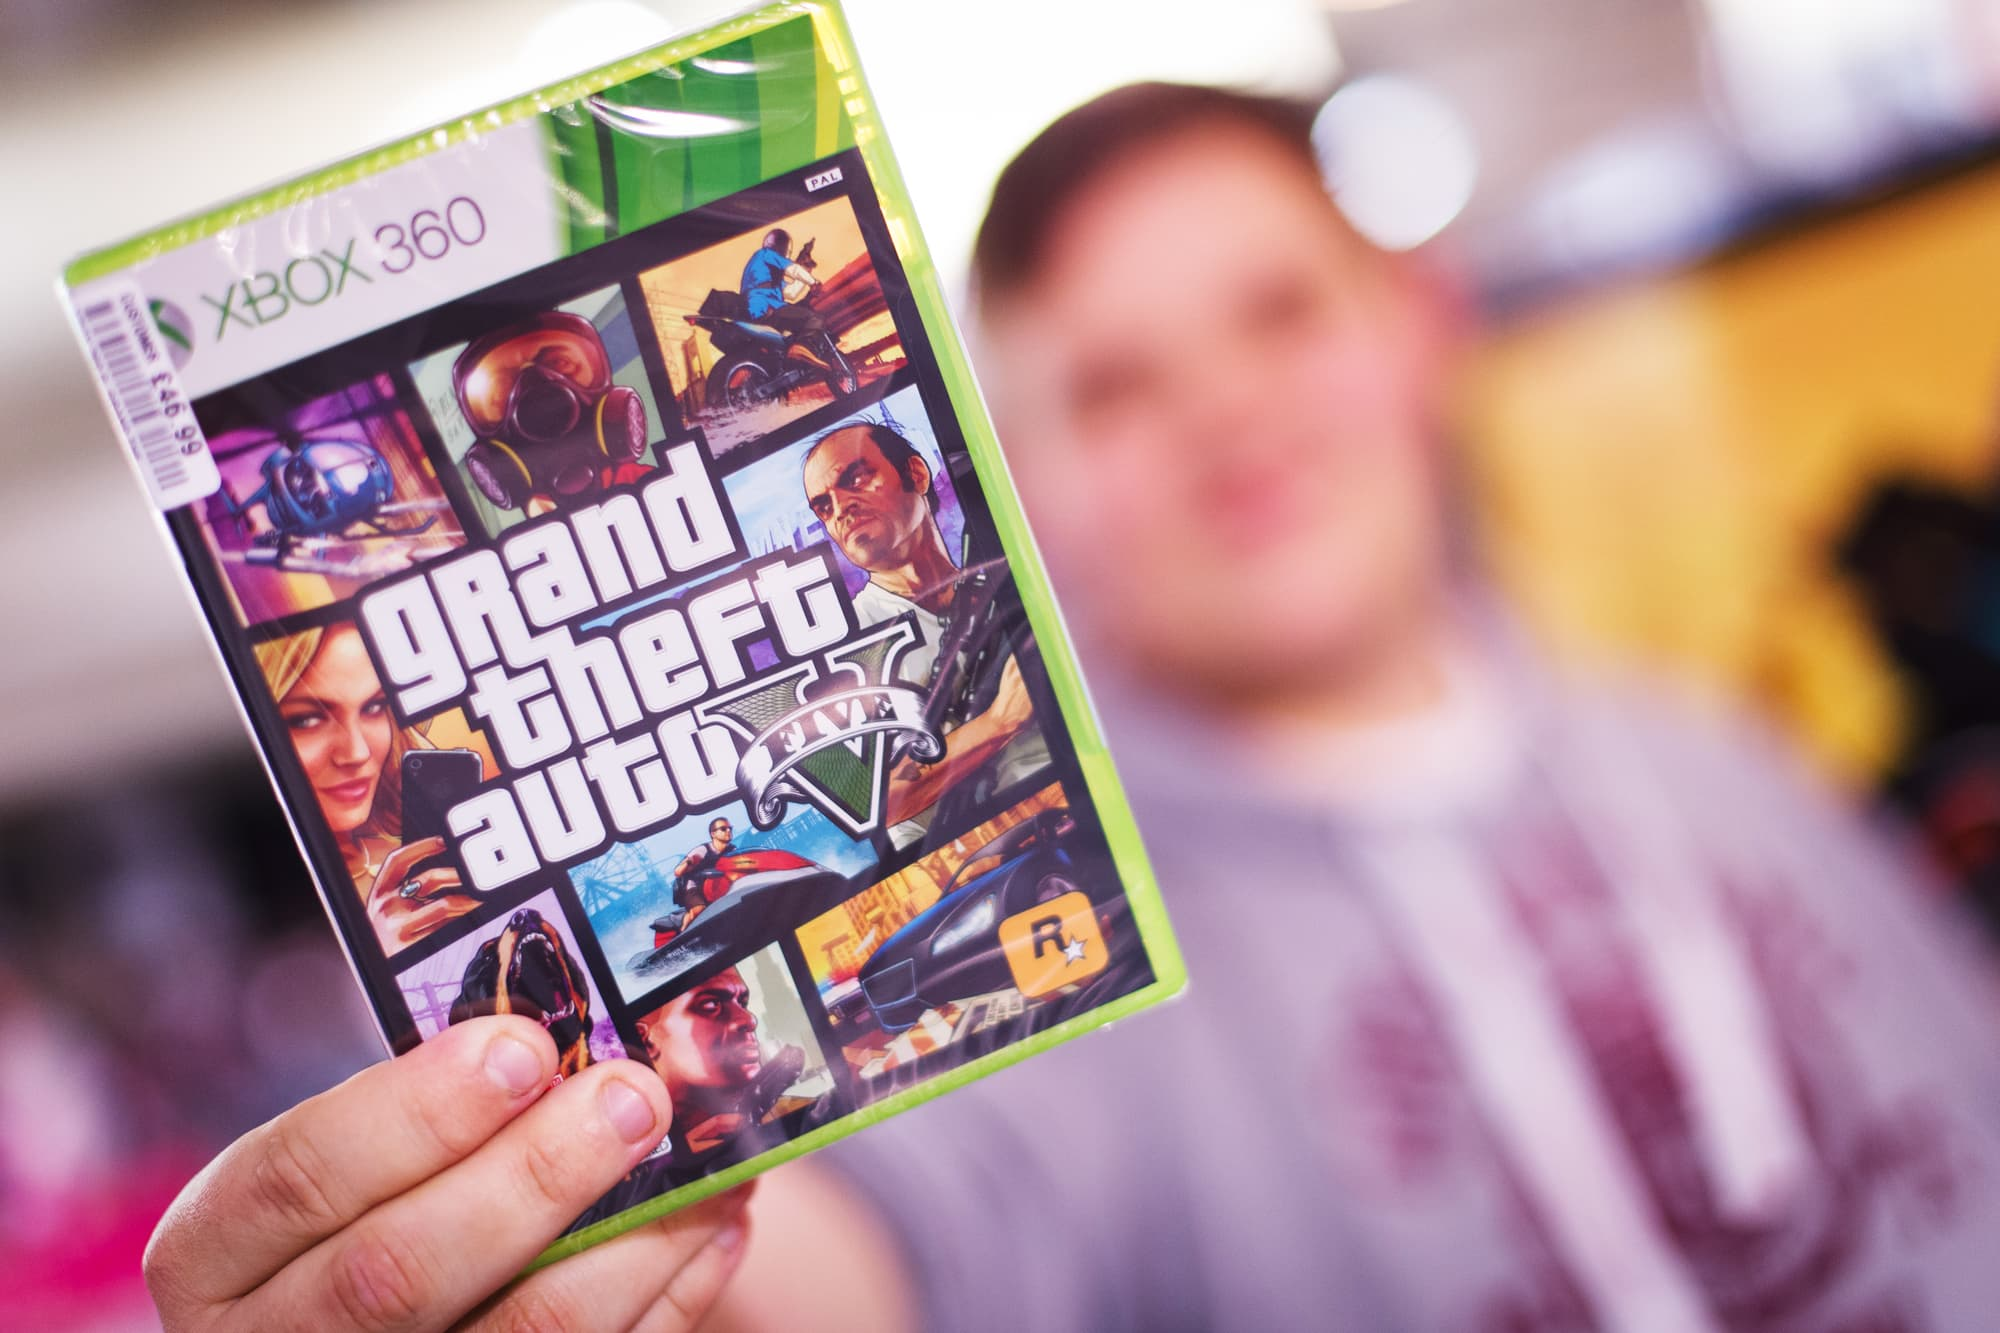 NBA 2K, Grand Theft Auto V help Take-Two surge past estimates